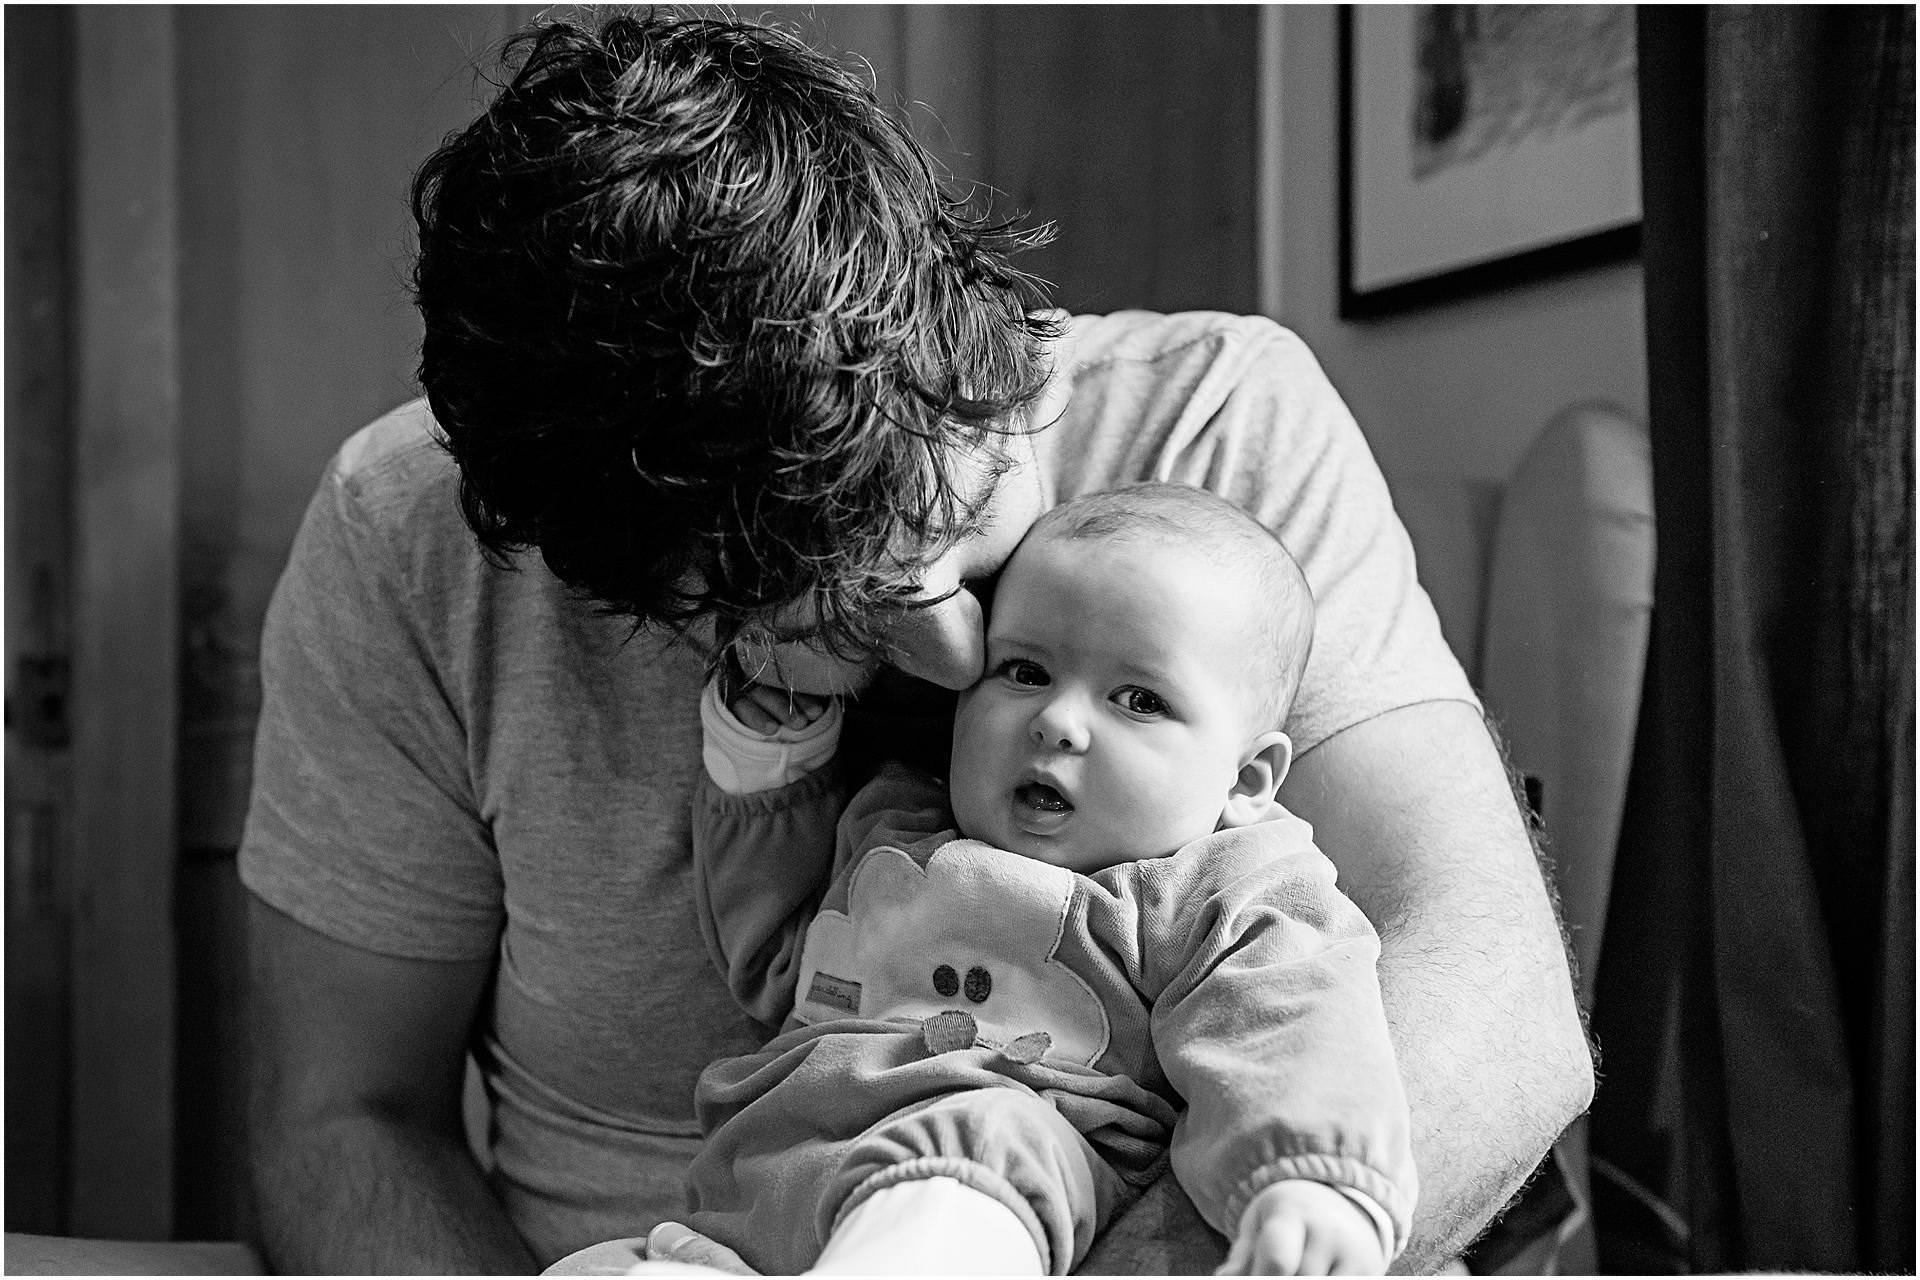 Newborn_photography with Sarah_bee_photography lifestyle_photography family_photography natural_photography photography_in_your_own_home baby_and_child_photography_1946.jpg